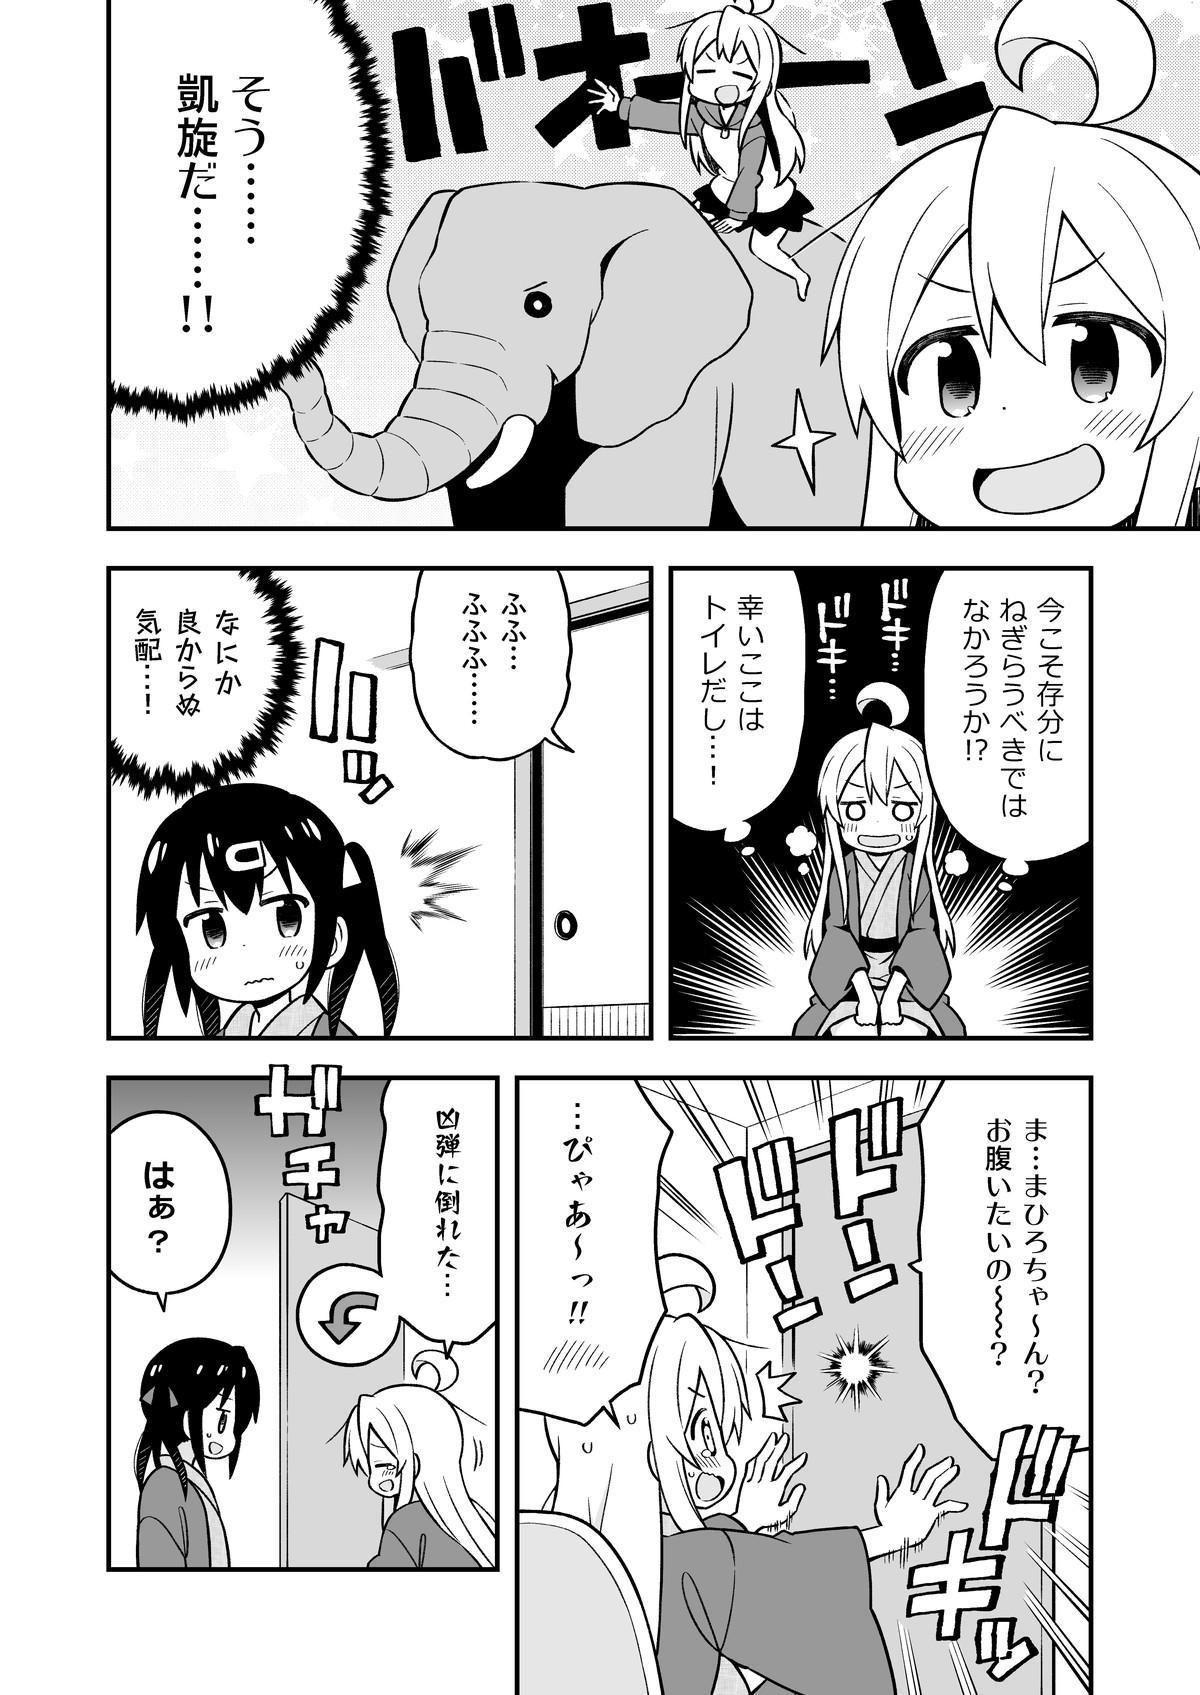 Onii-chan wa Oshimai! 6 44